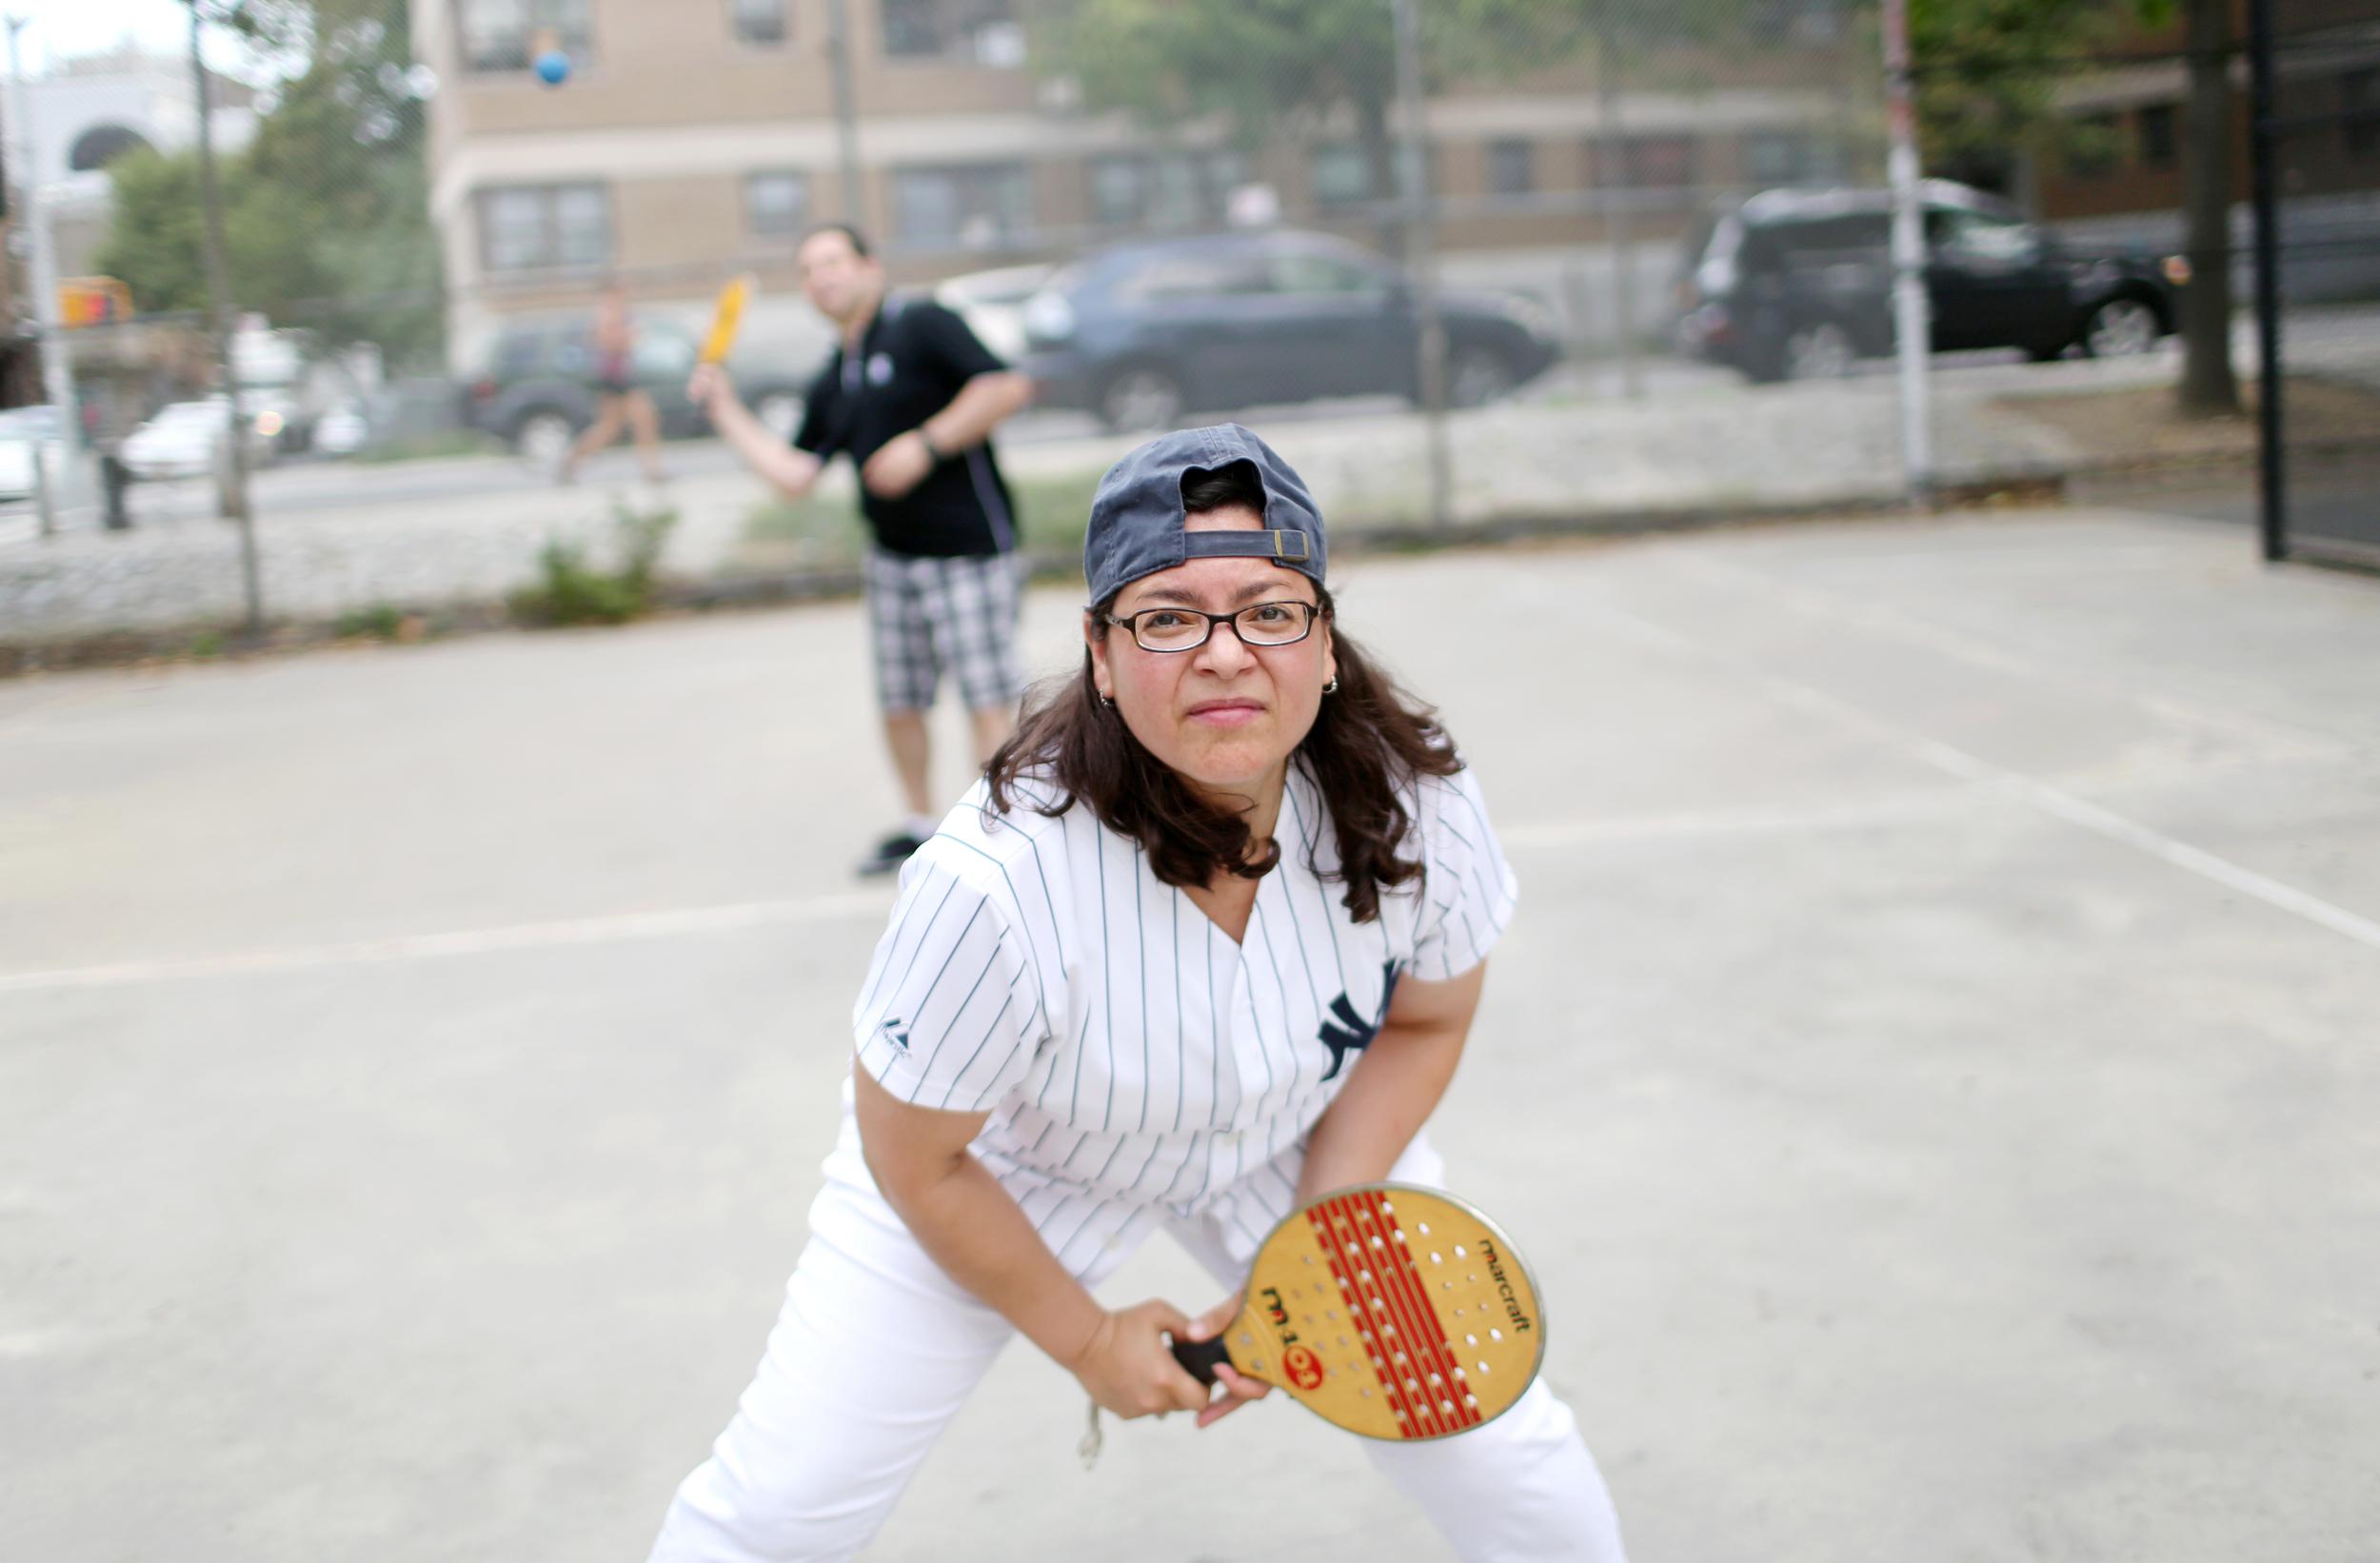 ROSIE MENDEZ, NEW YORK CITY COUNCILWOMAN, DISTRICT 2